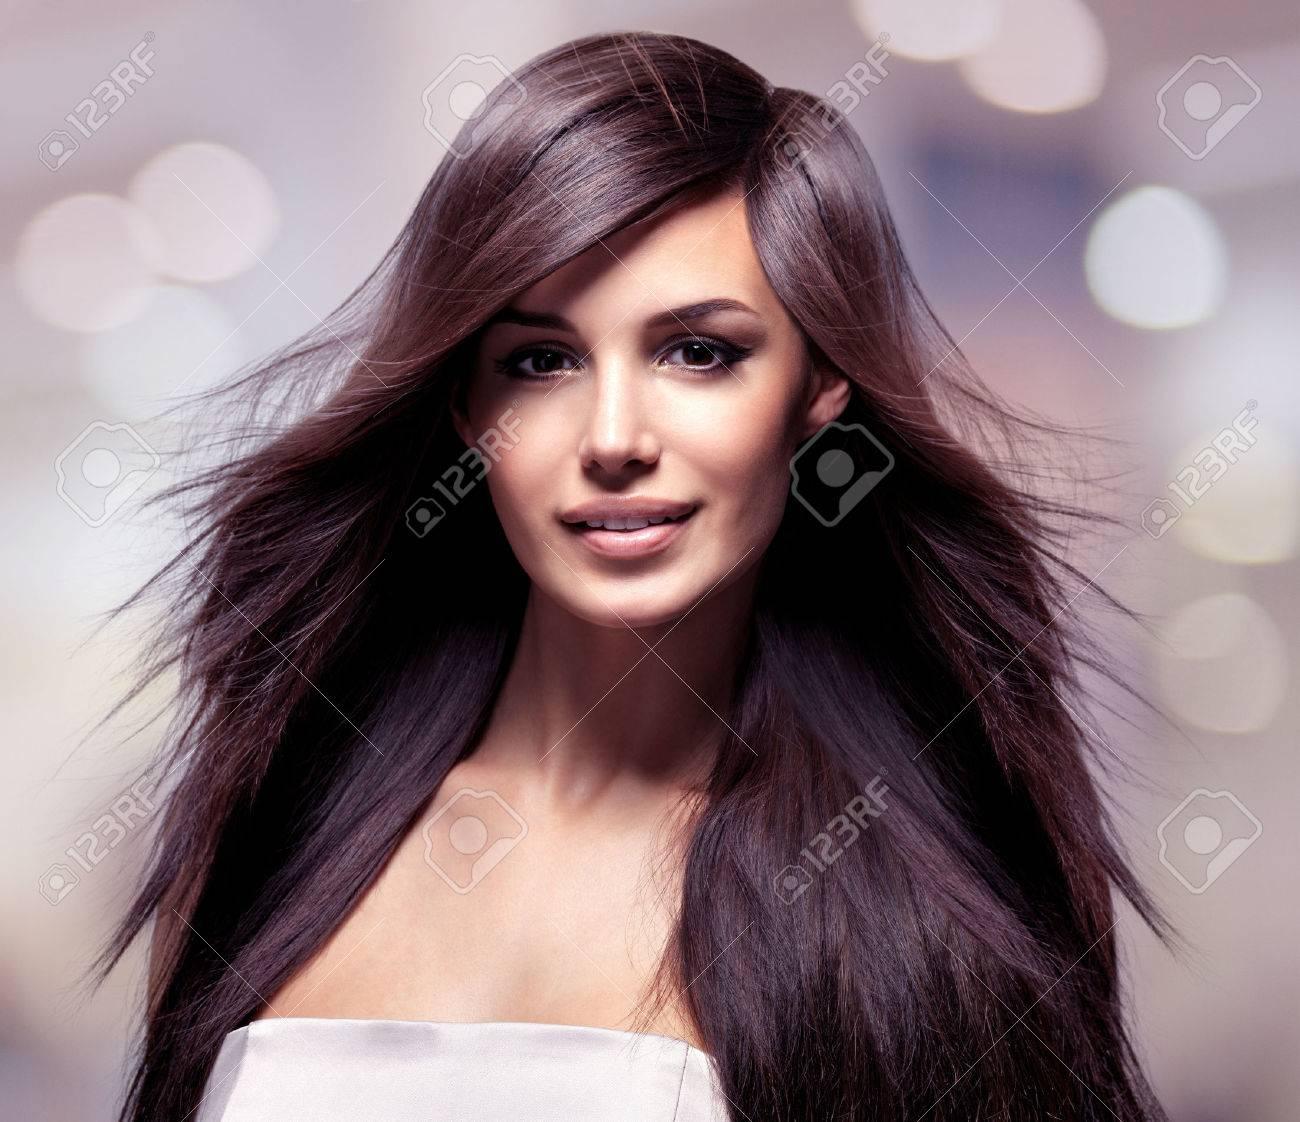 Fashion Model With Longs Cheveux Raides. Modèle De Mode Posant ...